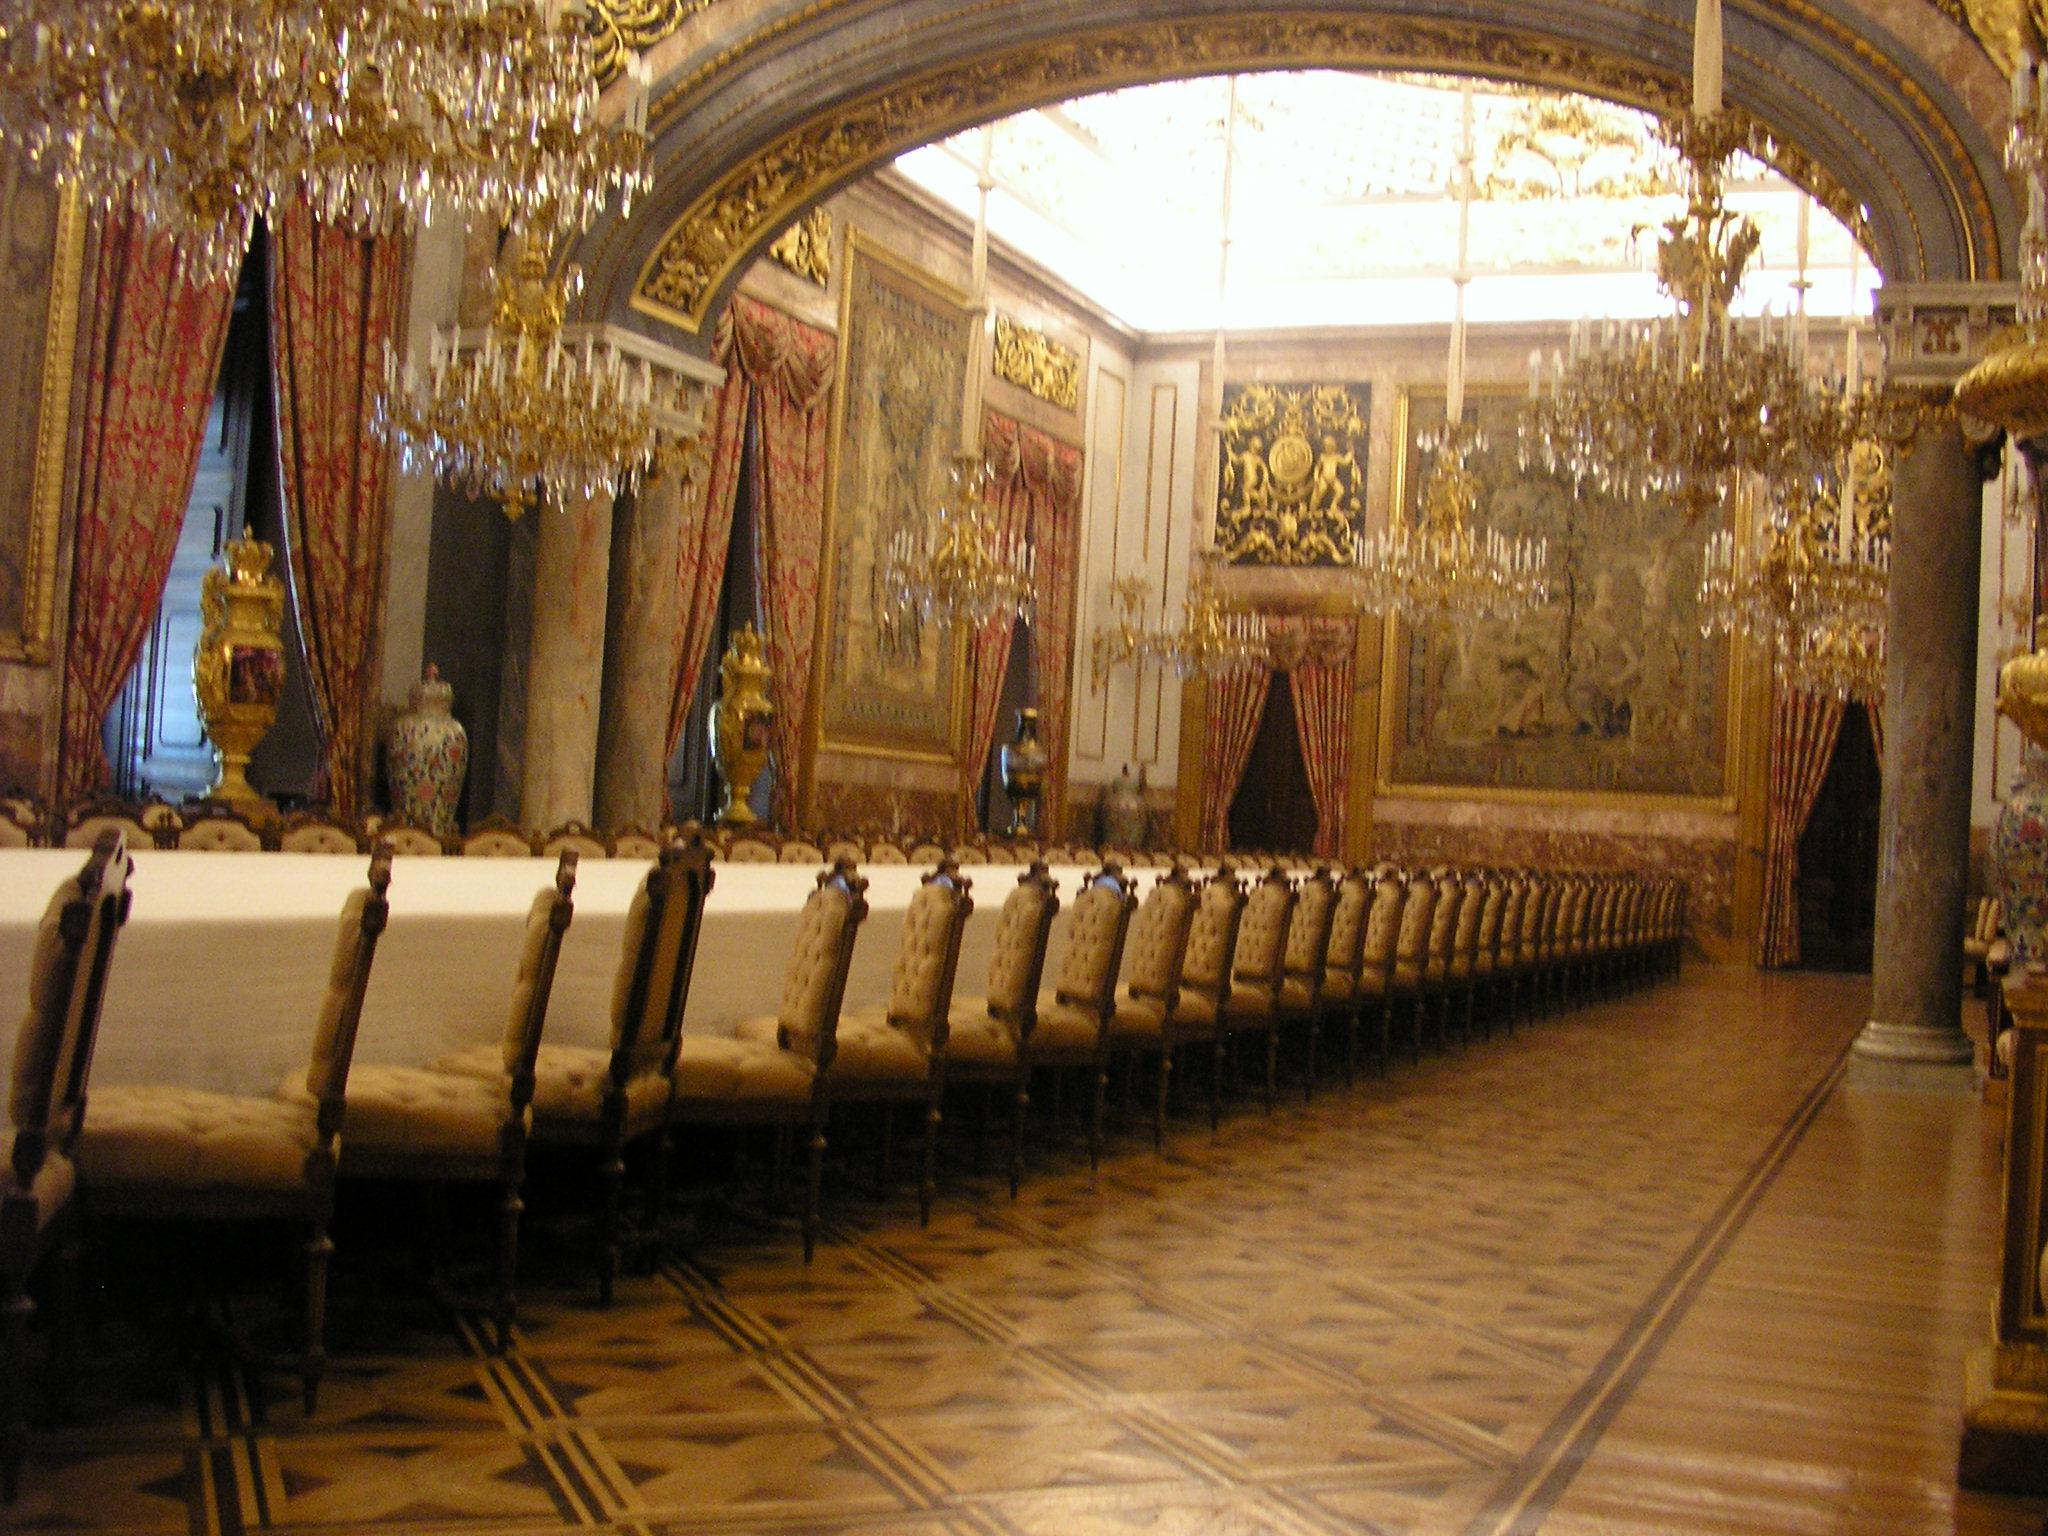 Detalle Del Edificio Palacio Real En Madrid Palacios Reales #2A67A1 2048 1536 Sala Da Pranzo Antica Roma